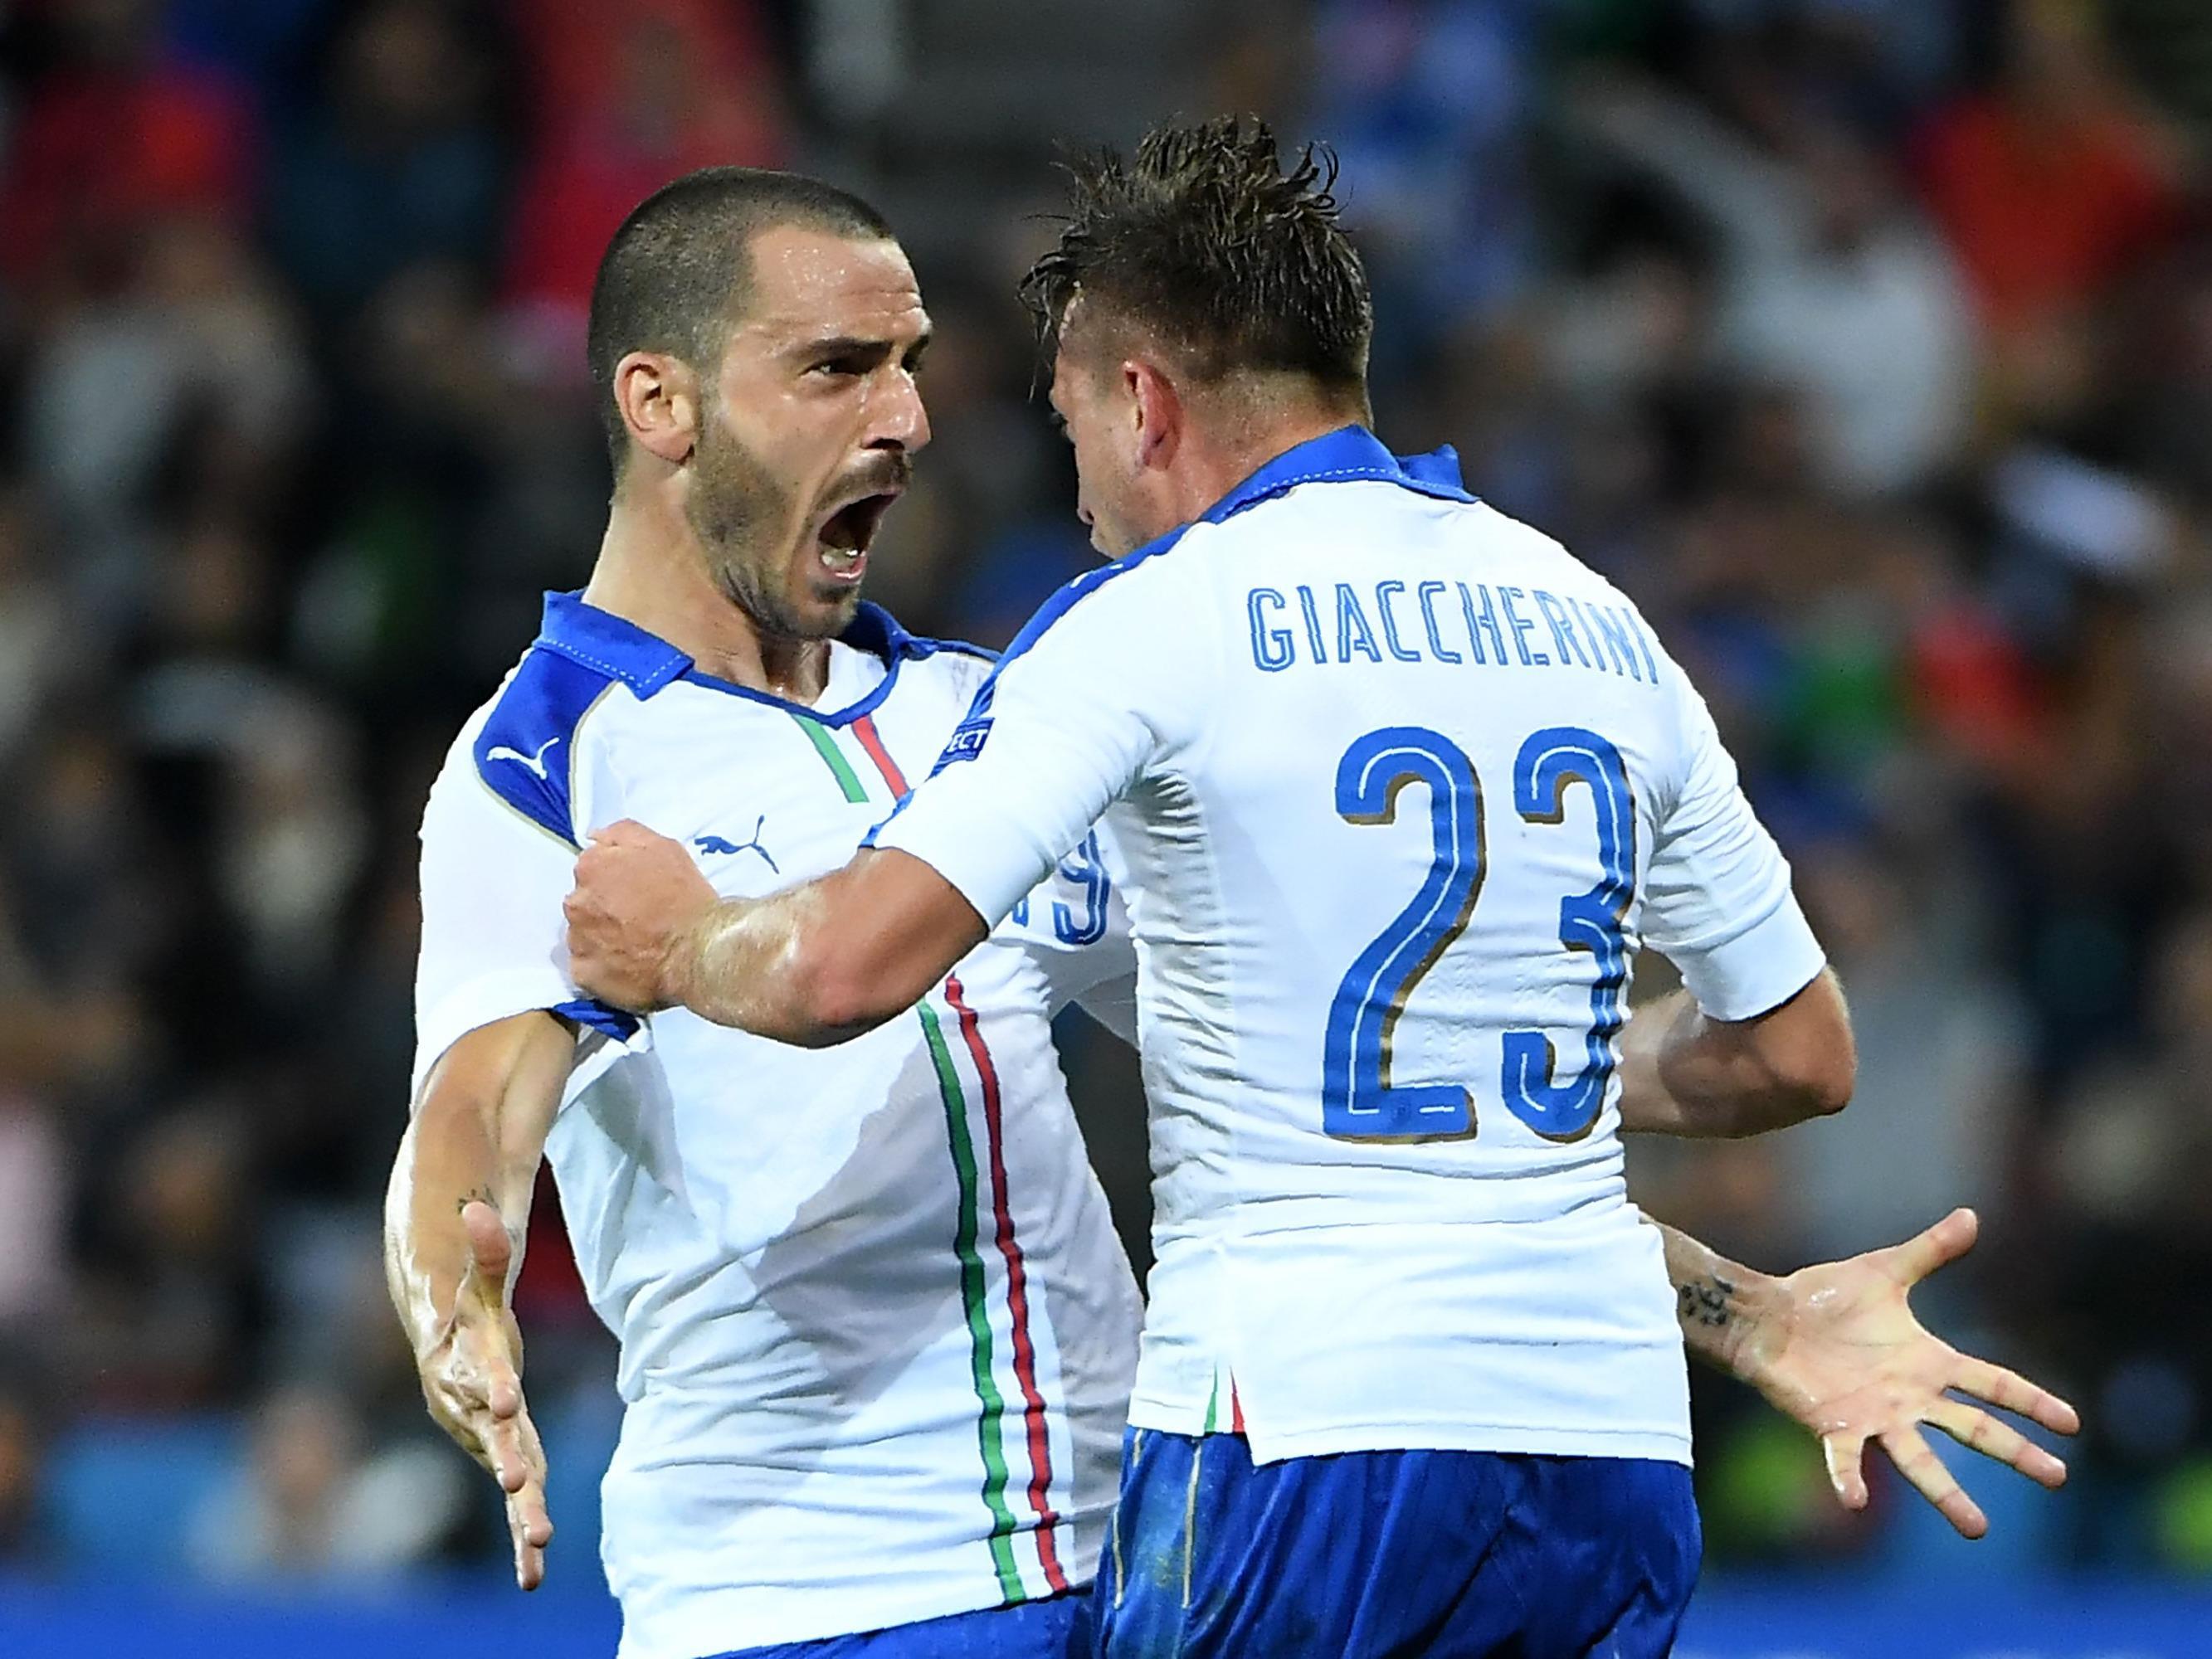 Italien feiert einen 2:0-Sieg über Belgien.